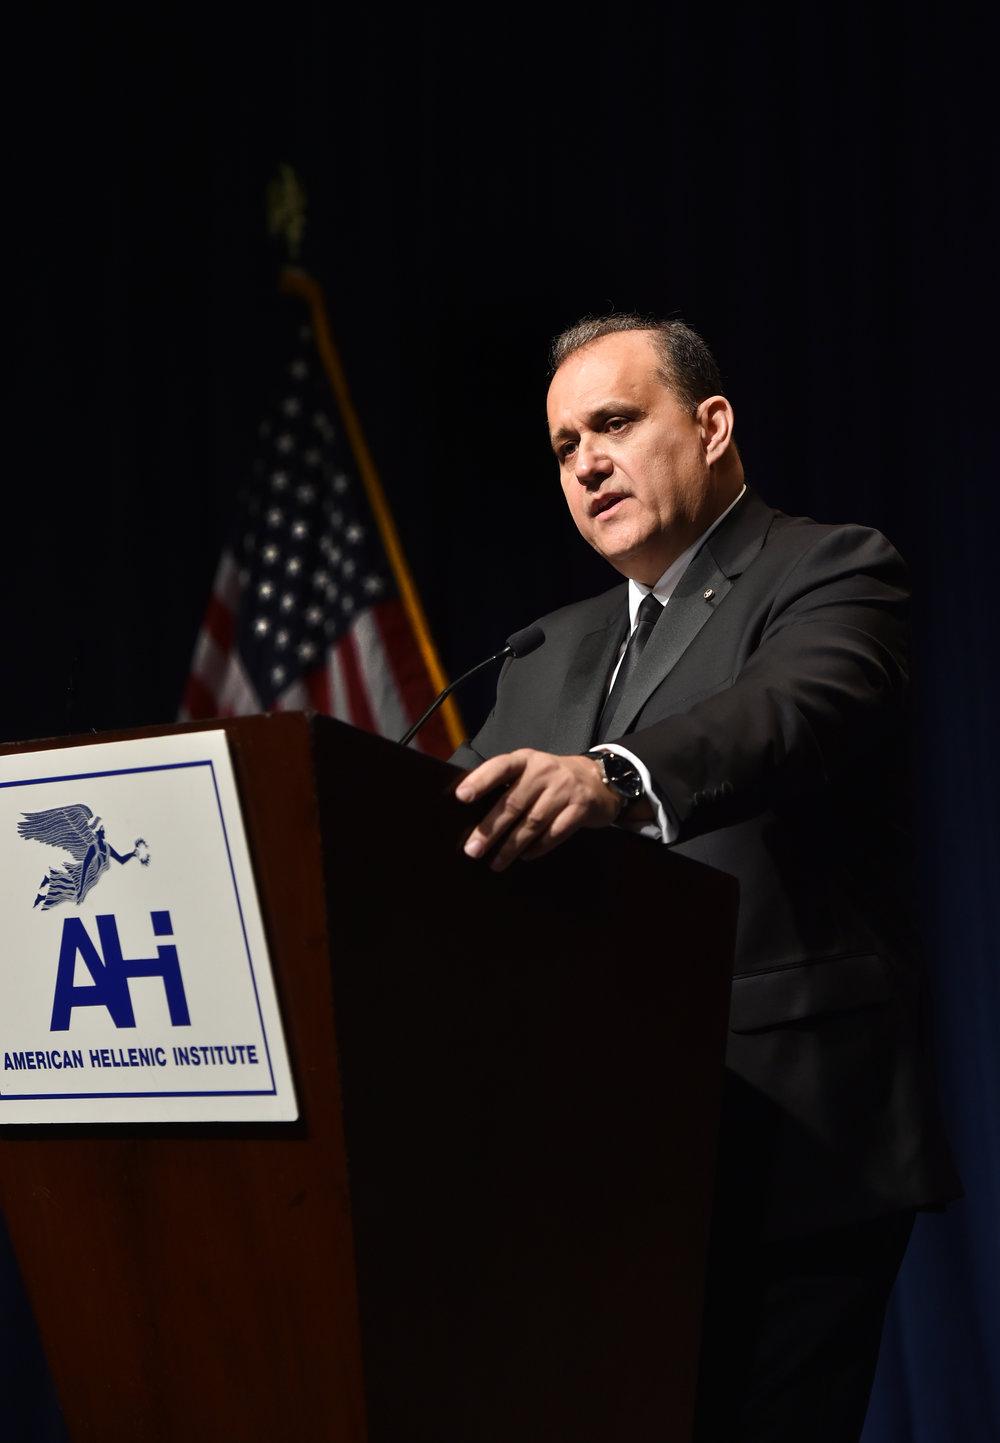 AHI President, Nick Larigakis